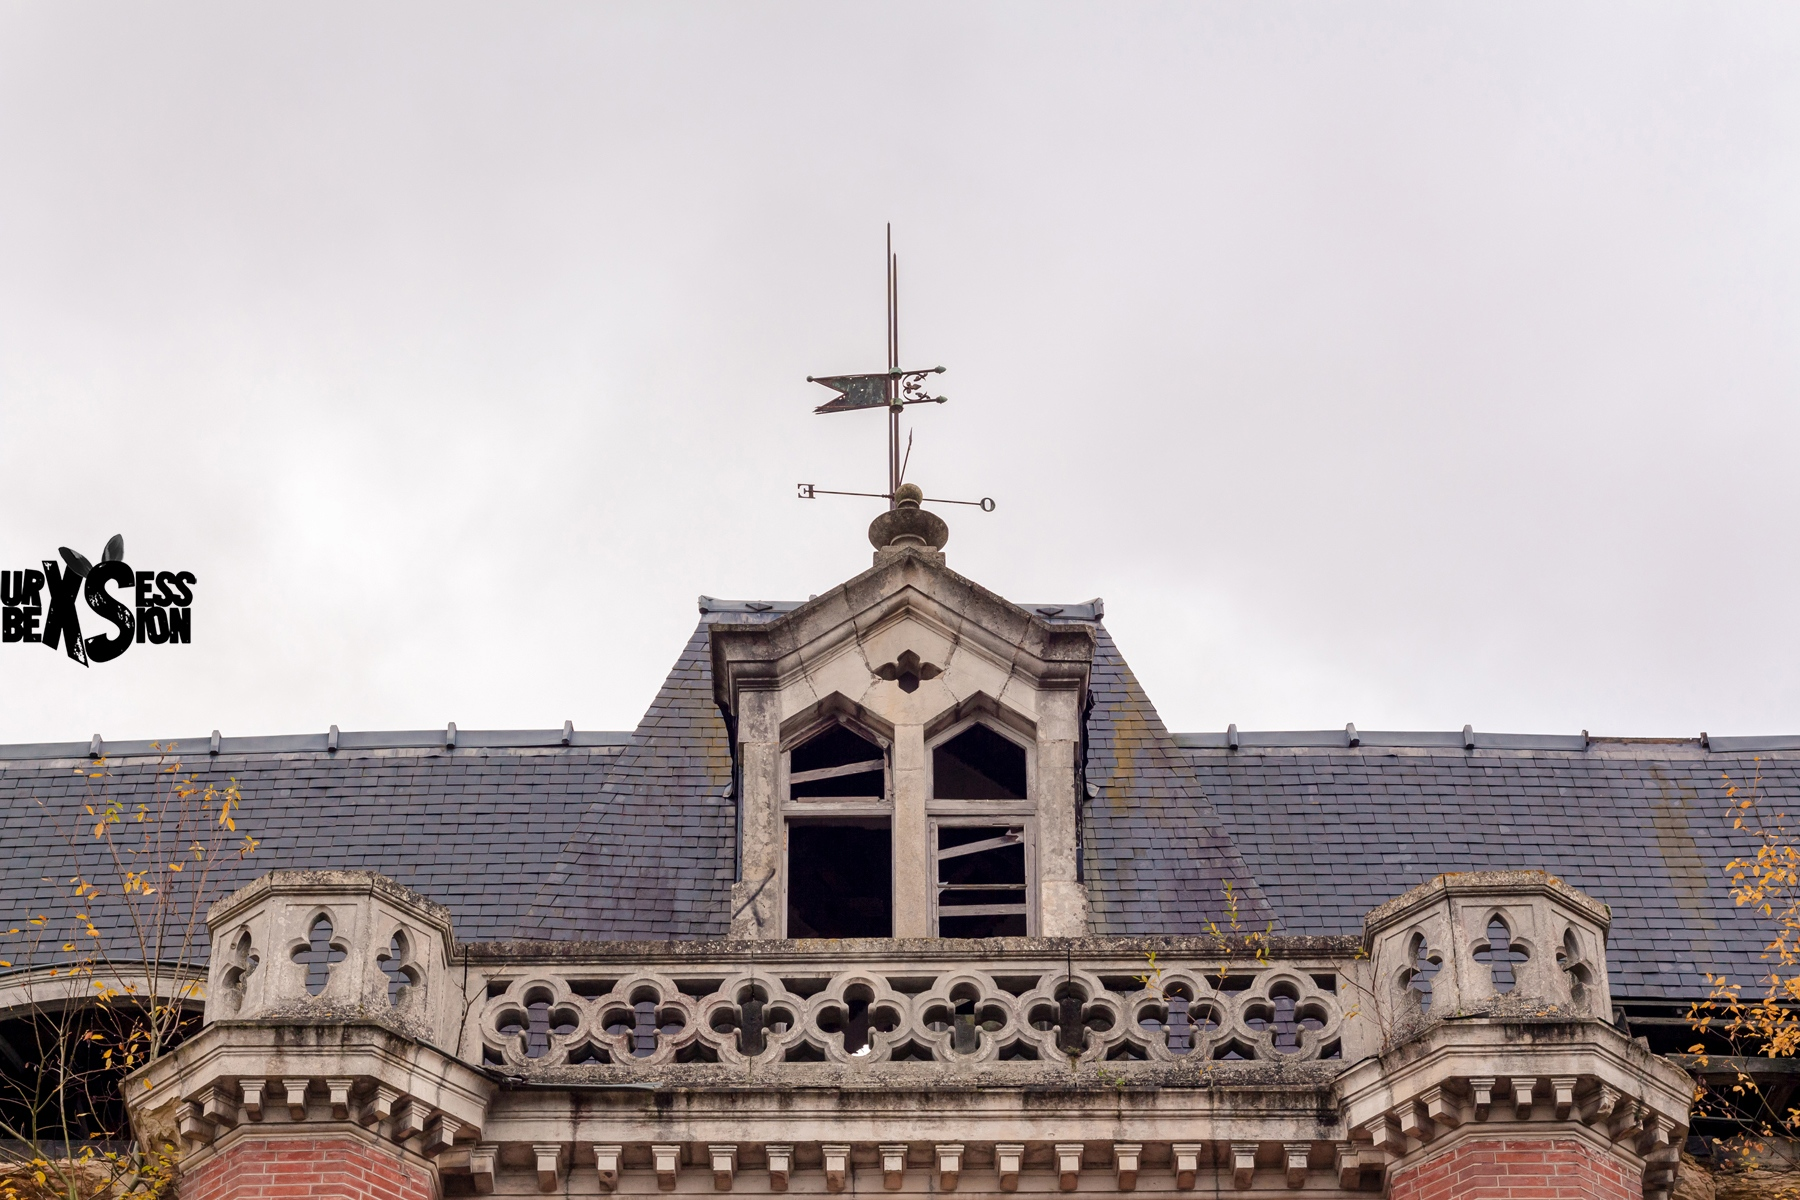 Chateau Jean Pierre Treiber | urbexsession.com/chateau-jean-pierre-treiber | Urbex France